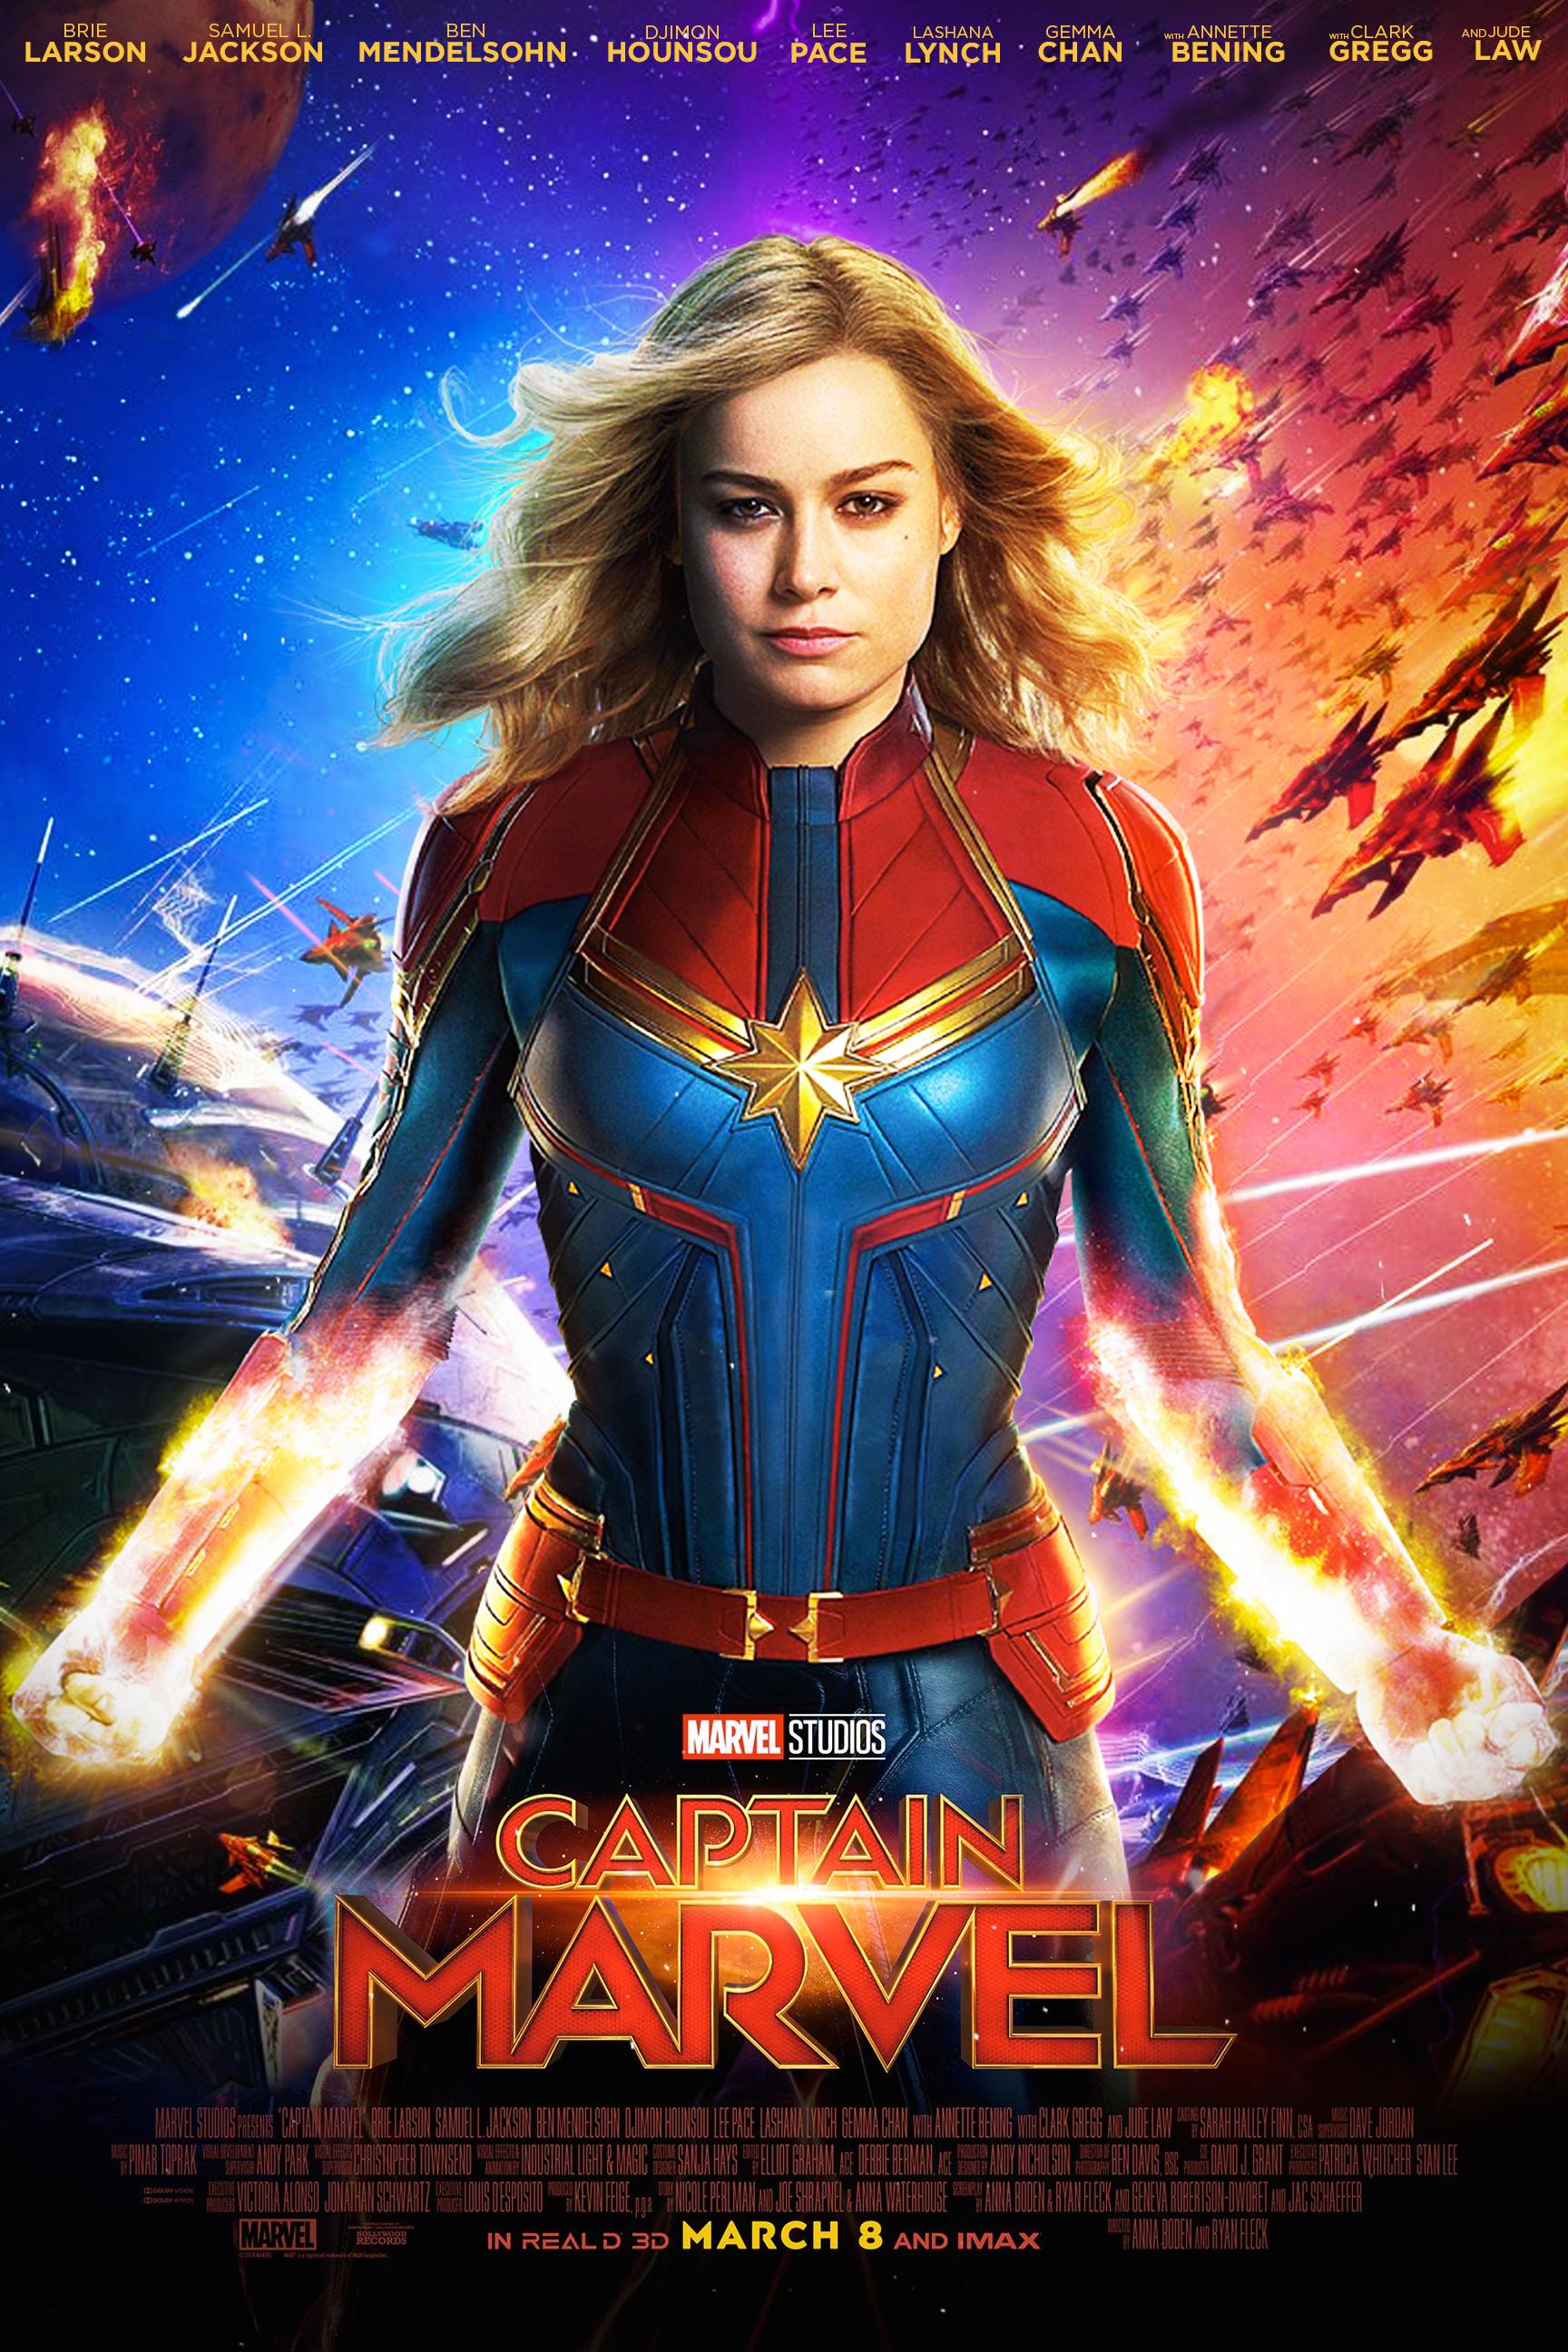 captain marvel streaming cb01 hd ita film altadefinizione gratis